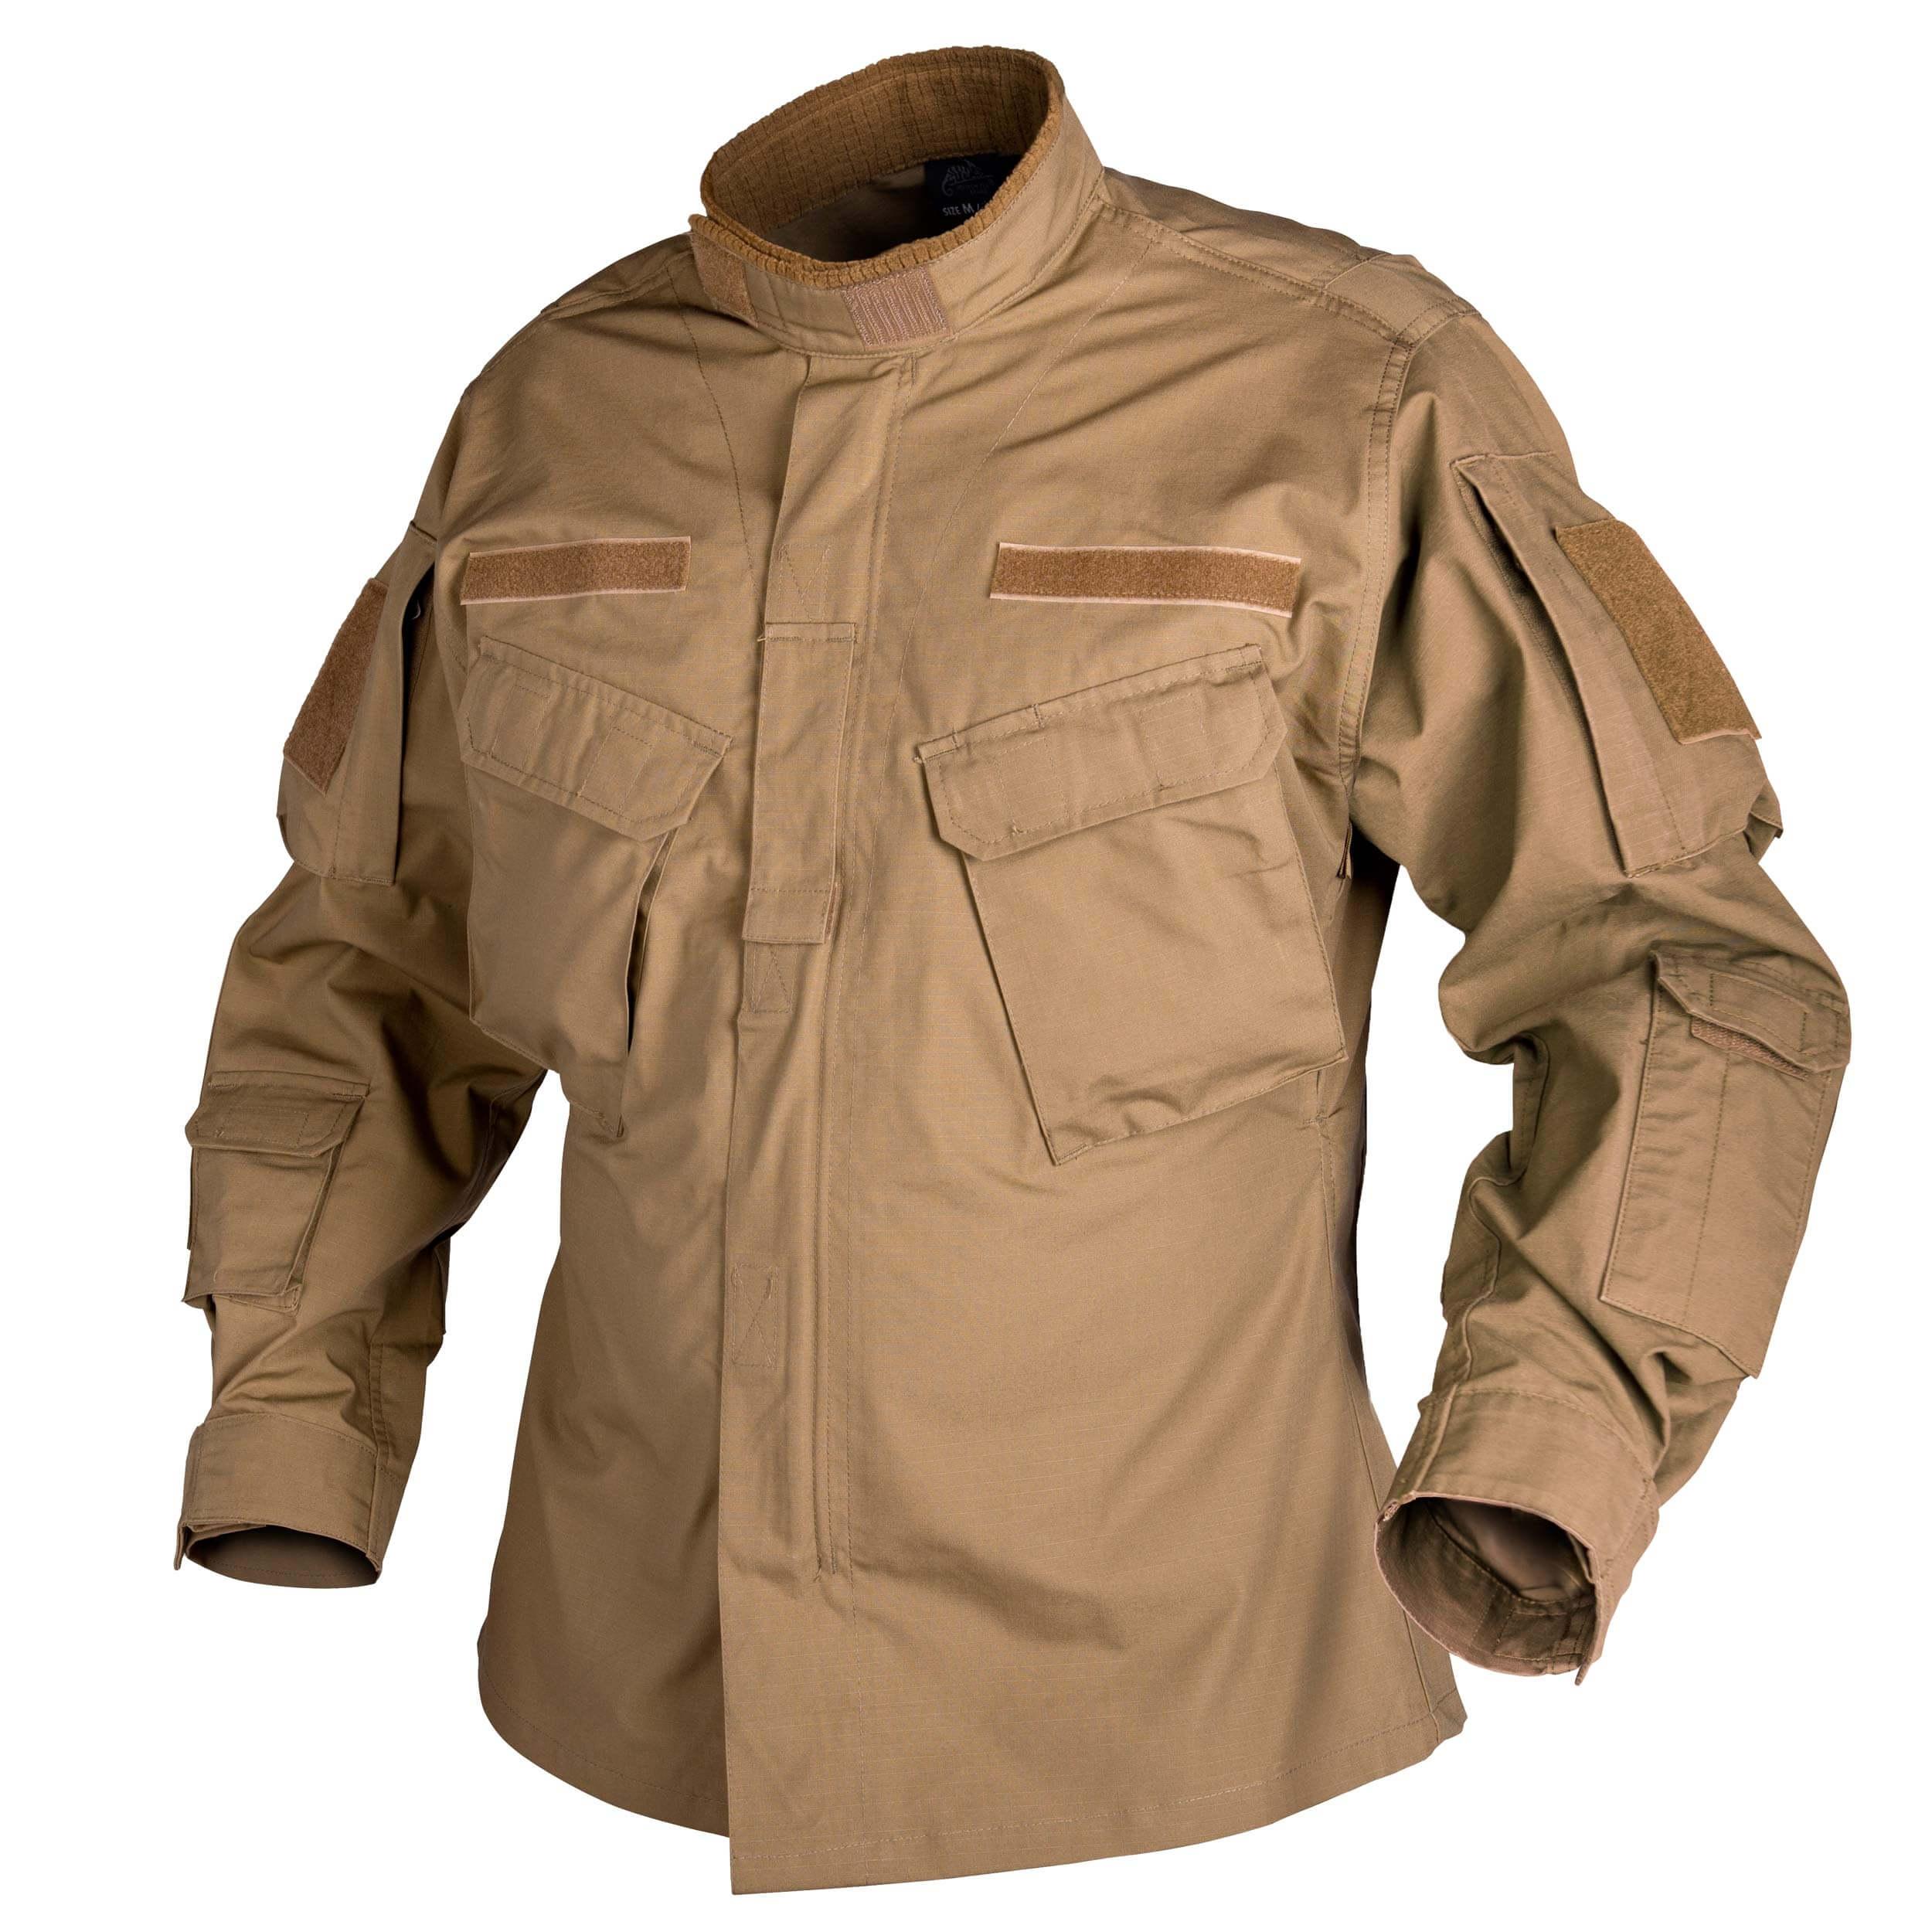 Helikon-Tex CPU Shirt - PolyCotton Ripstop - Coyote